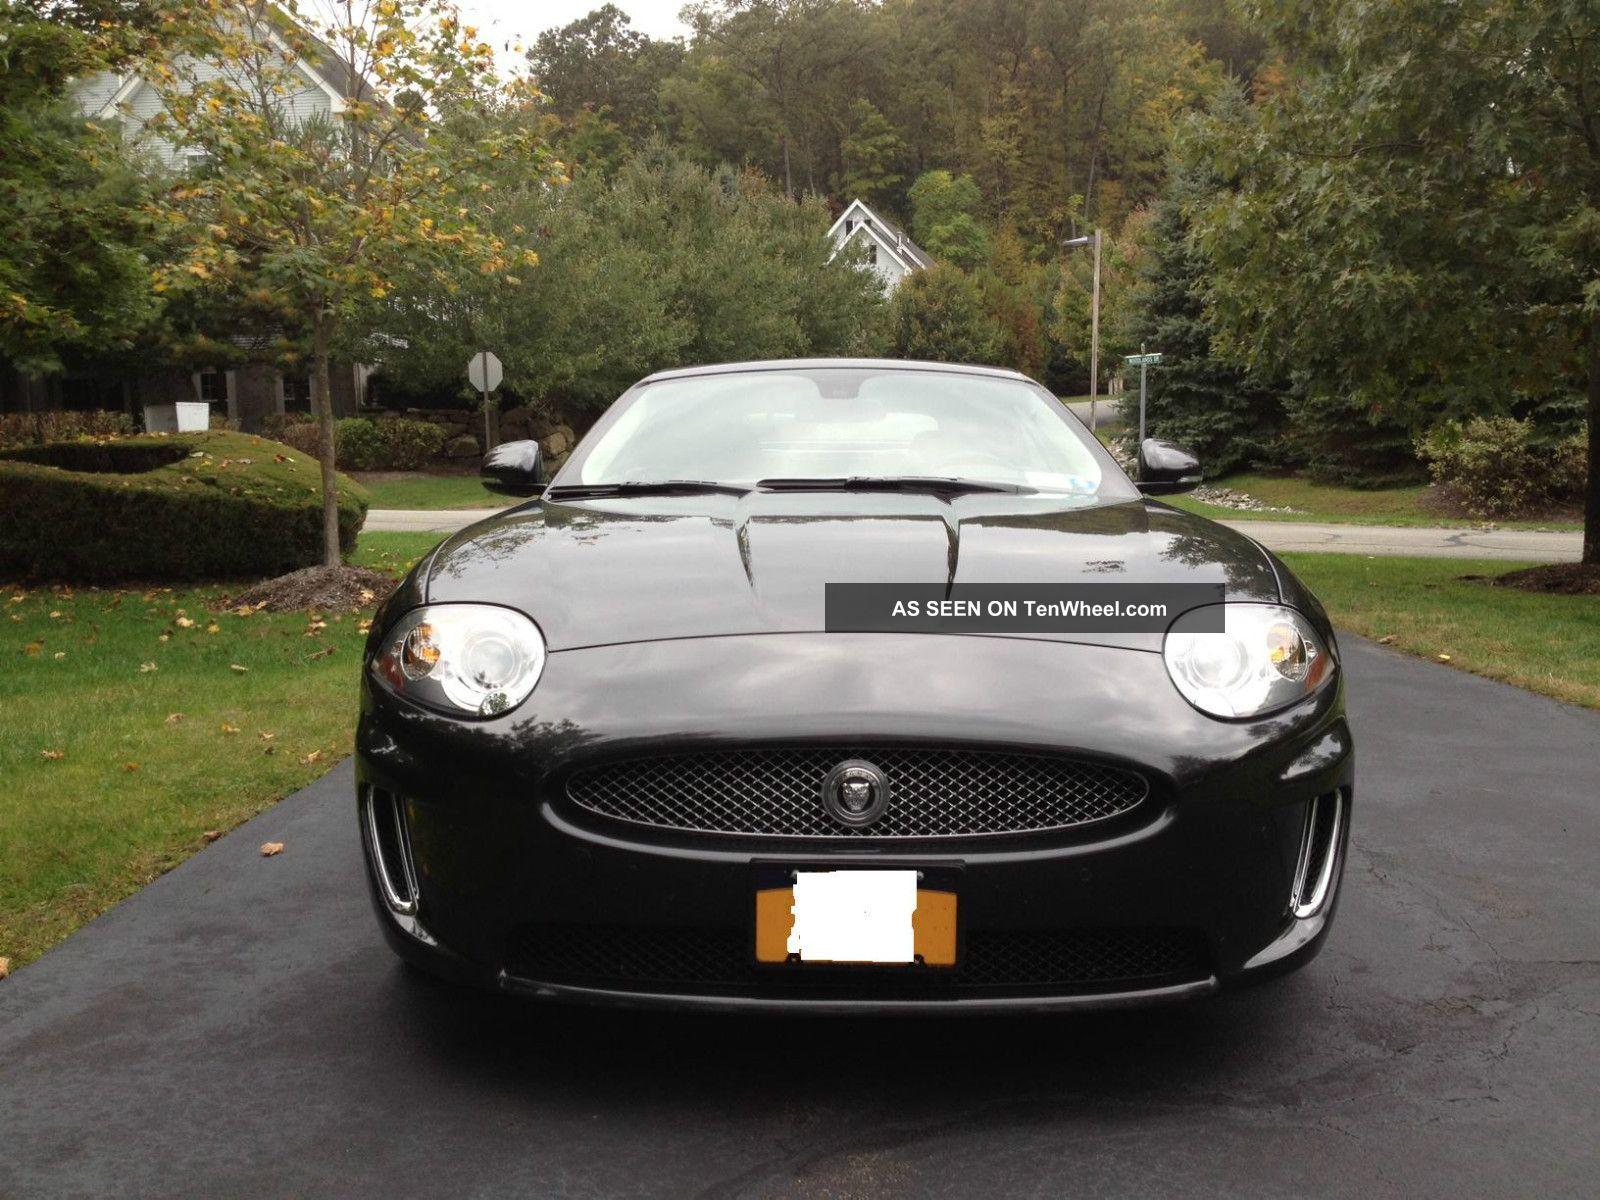 2011 jaguar xk convertible. Black Bedroom Furniture Sets. Home Design Ideas